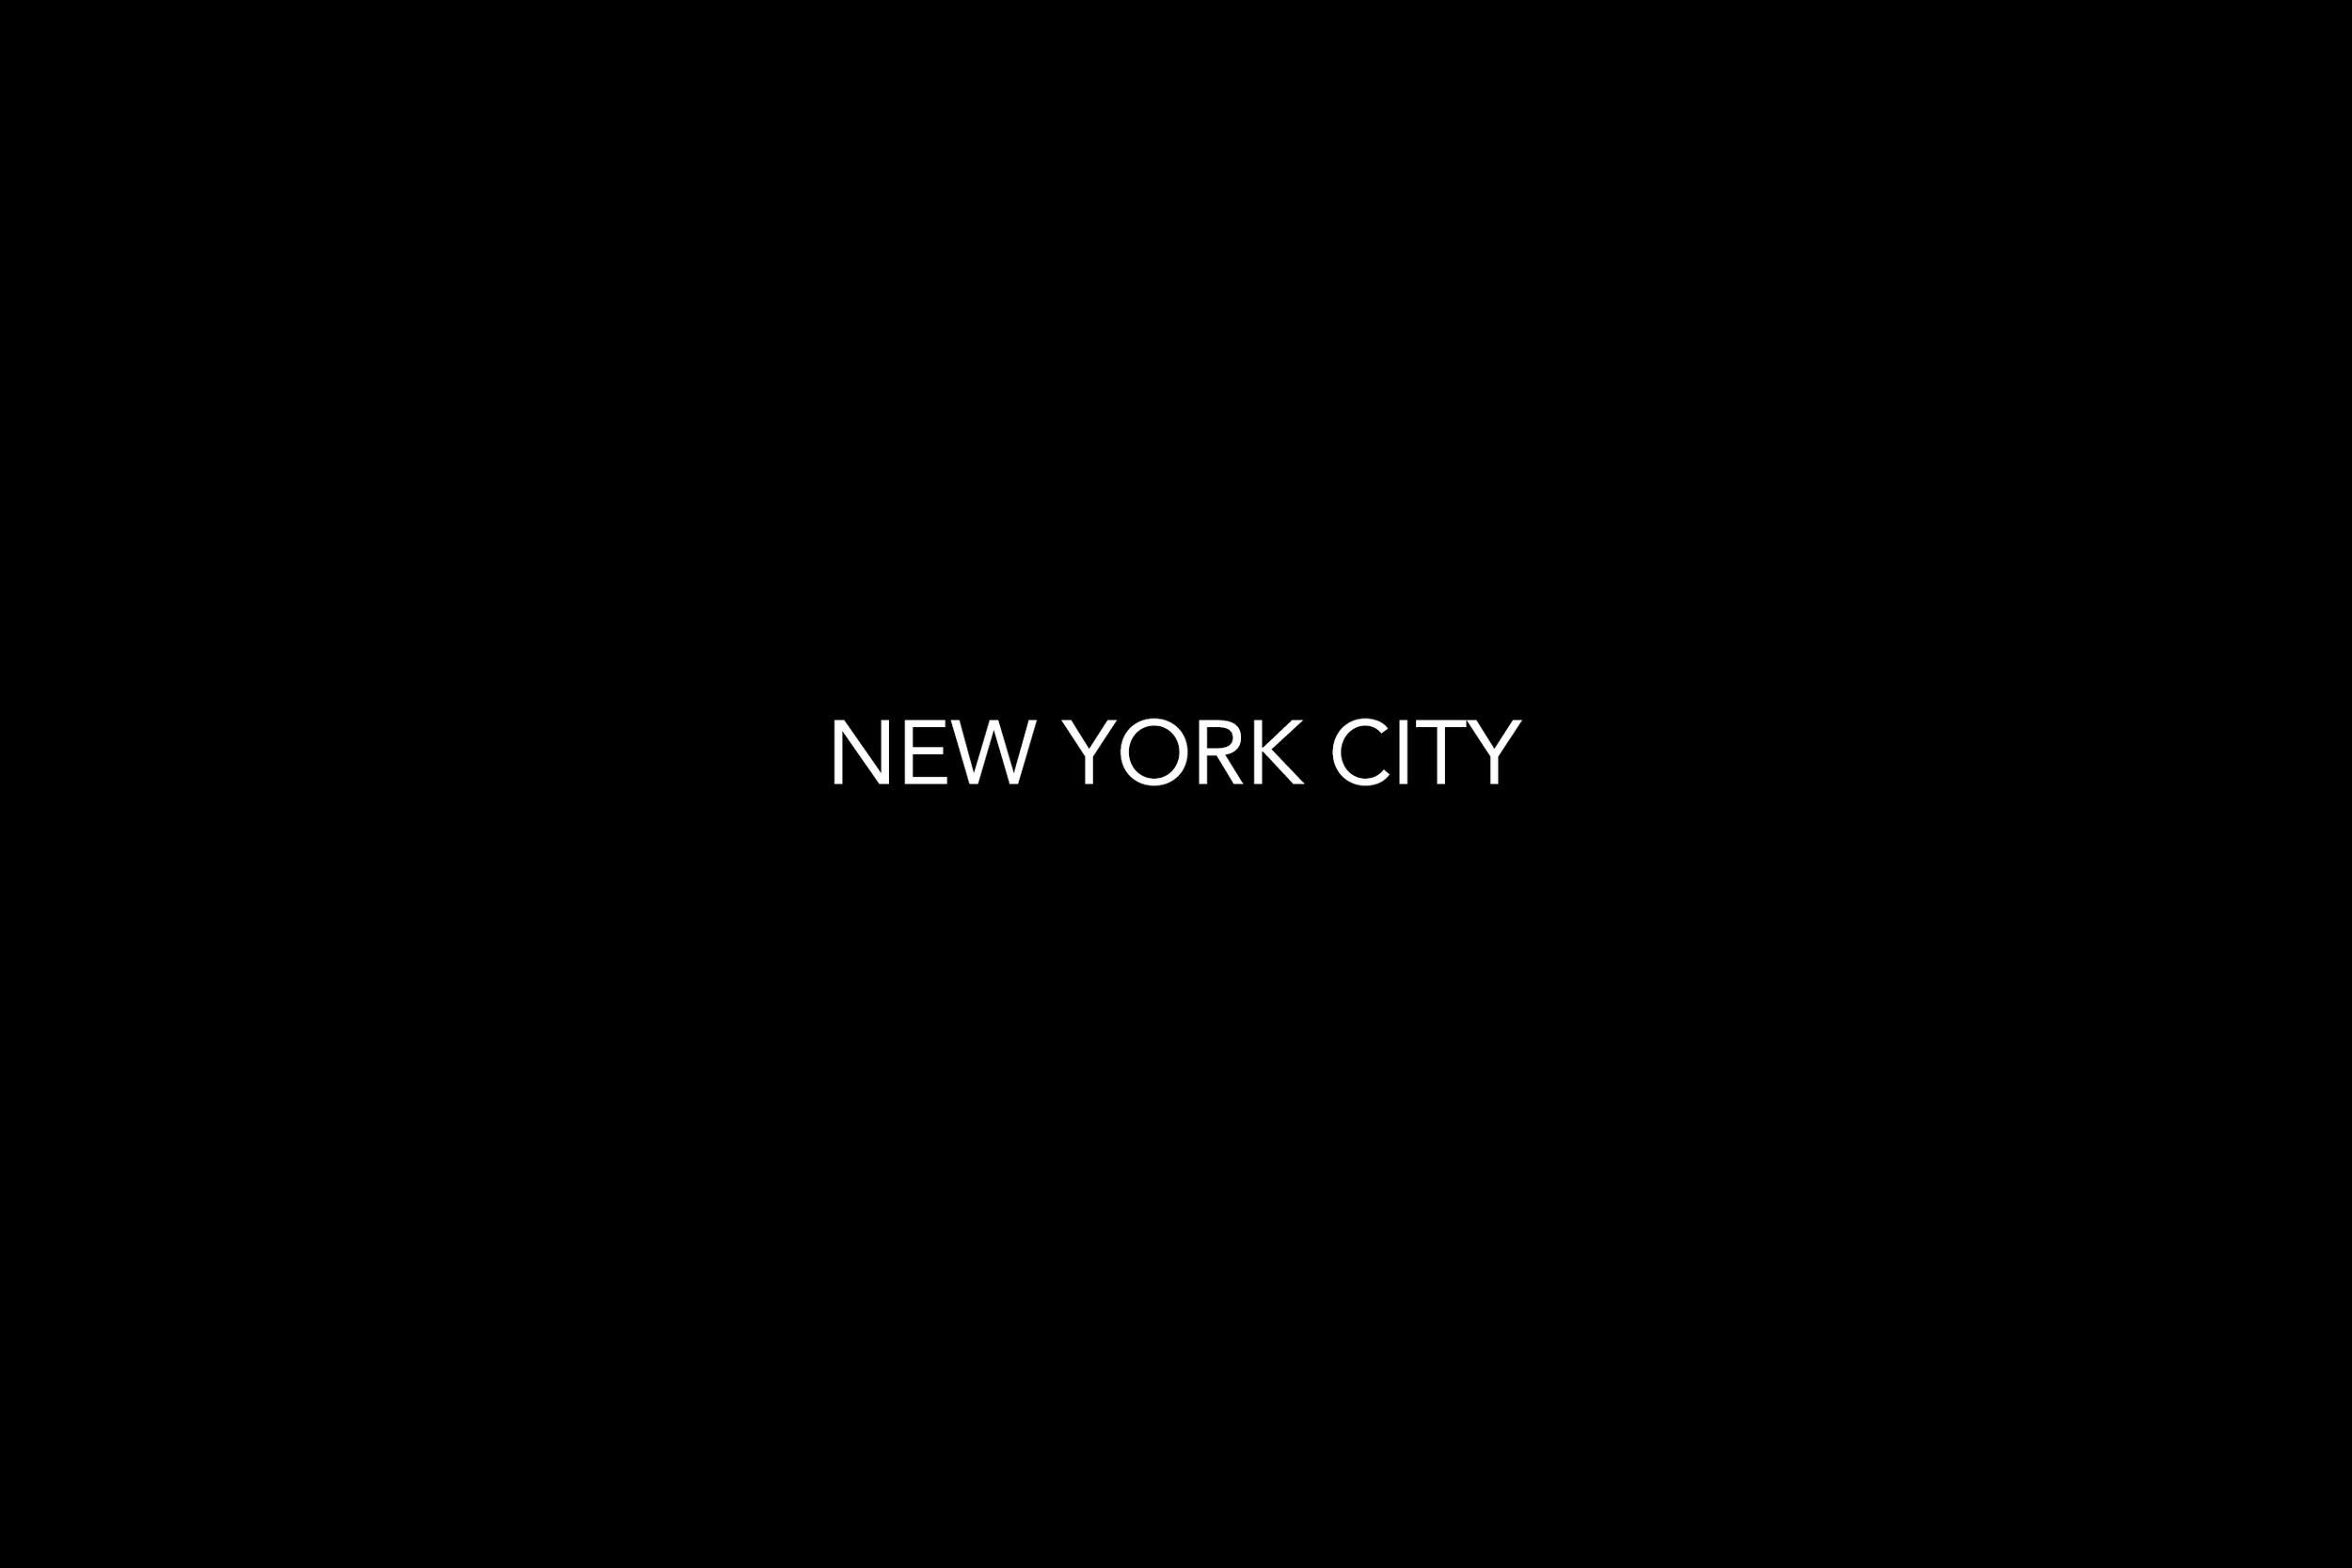 newyorkcity.png